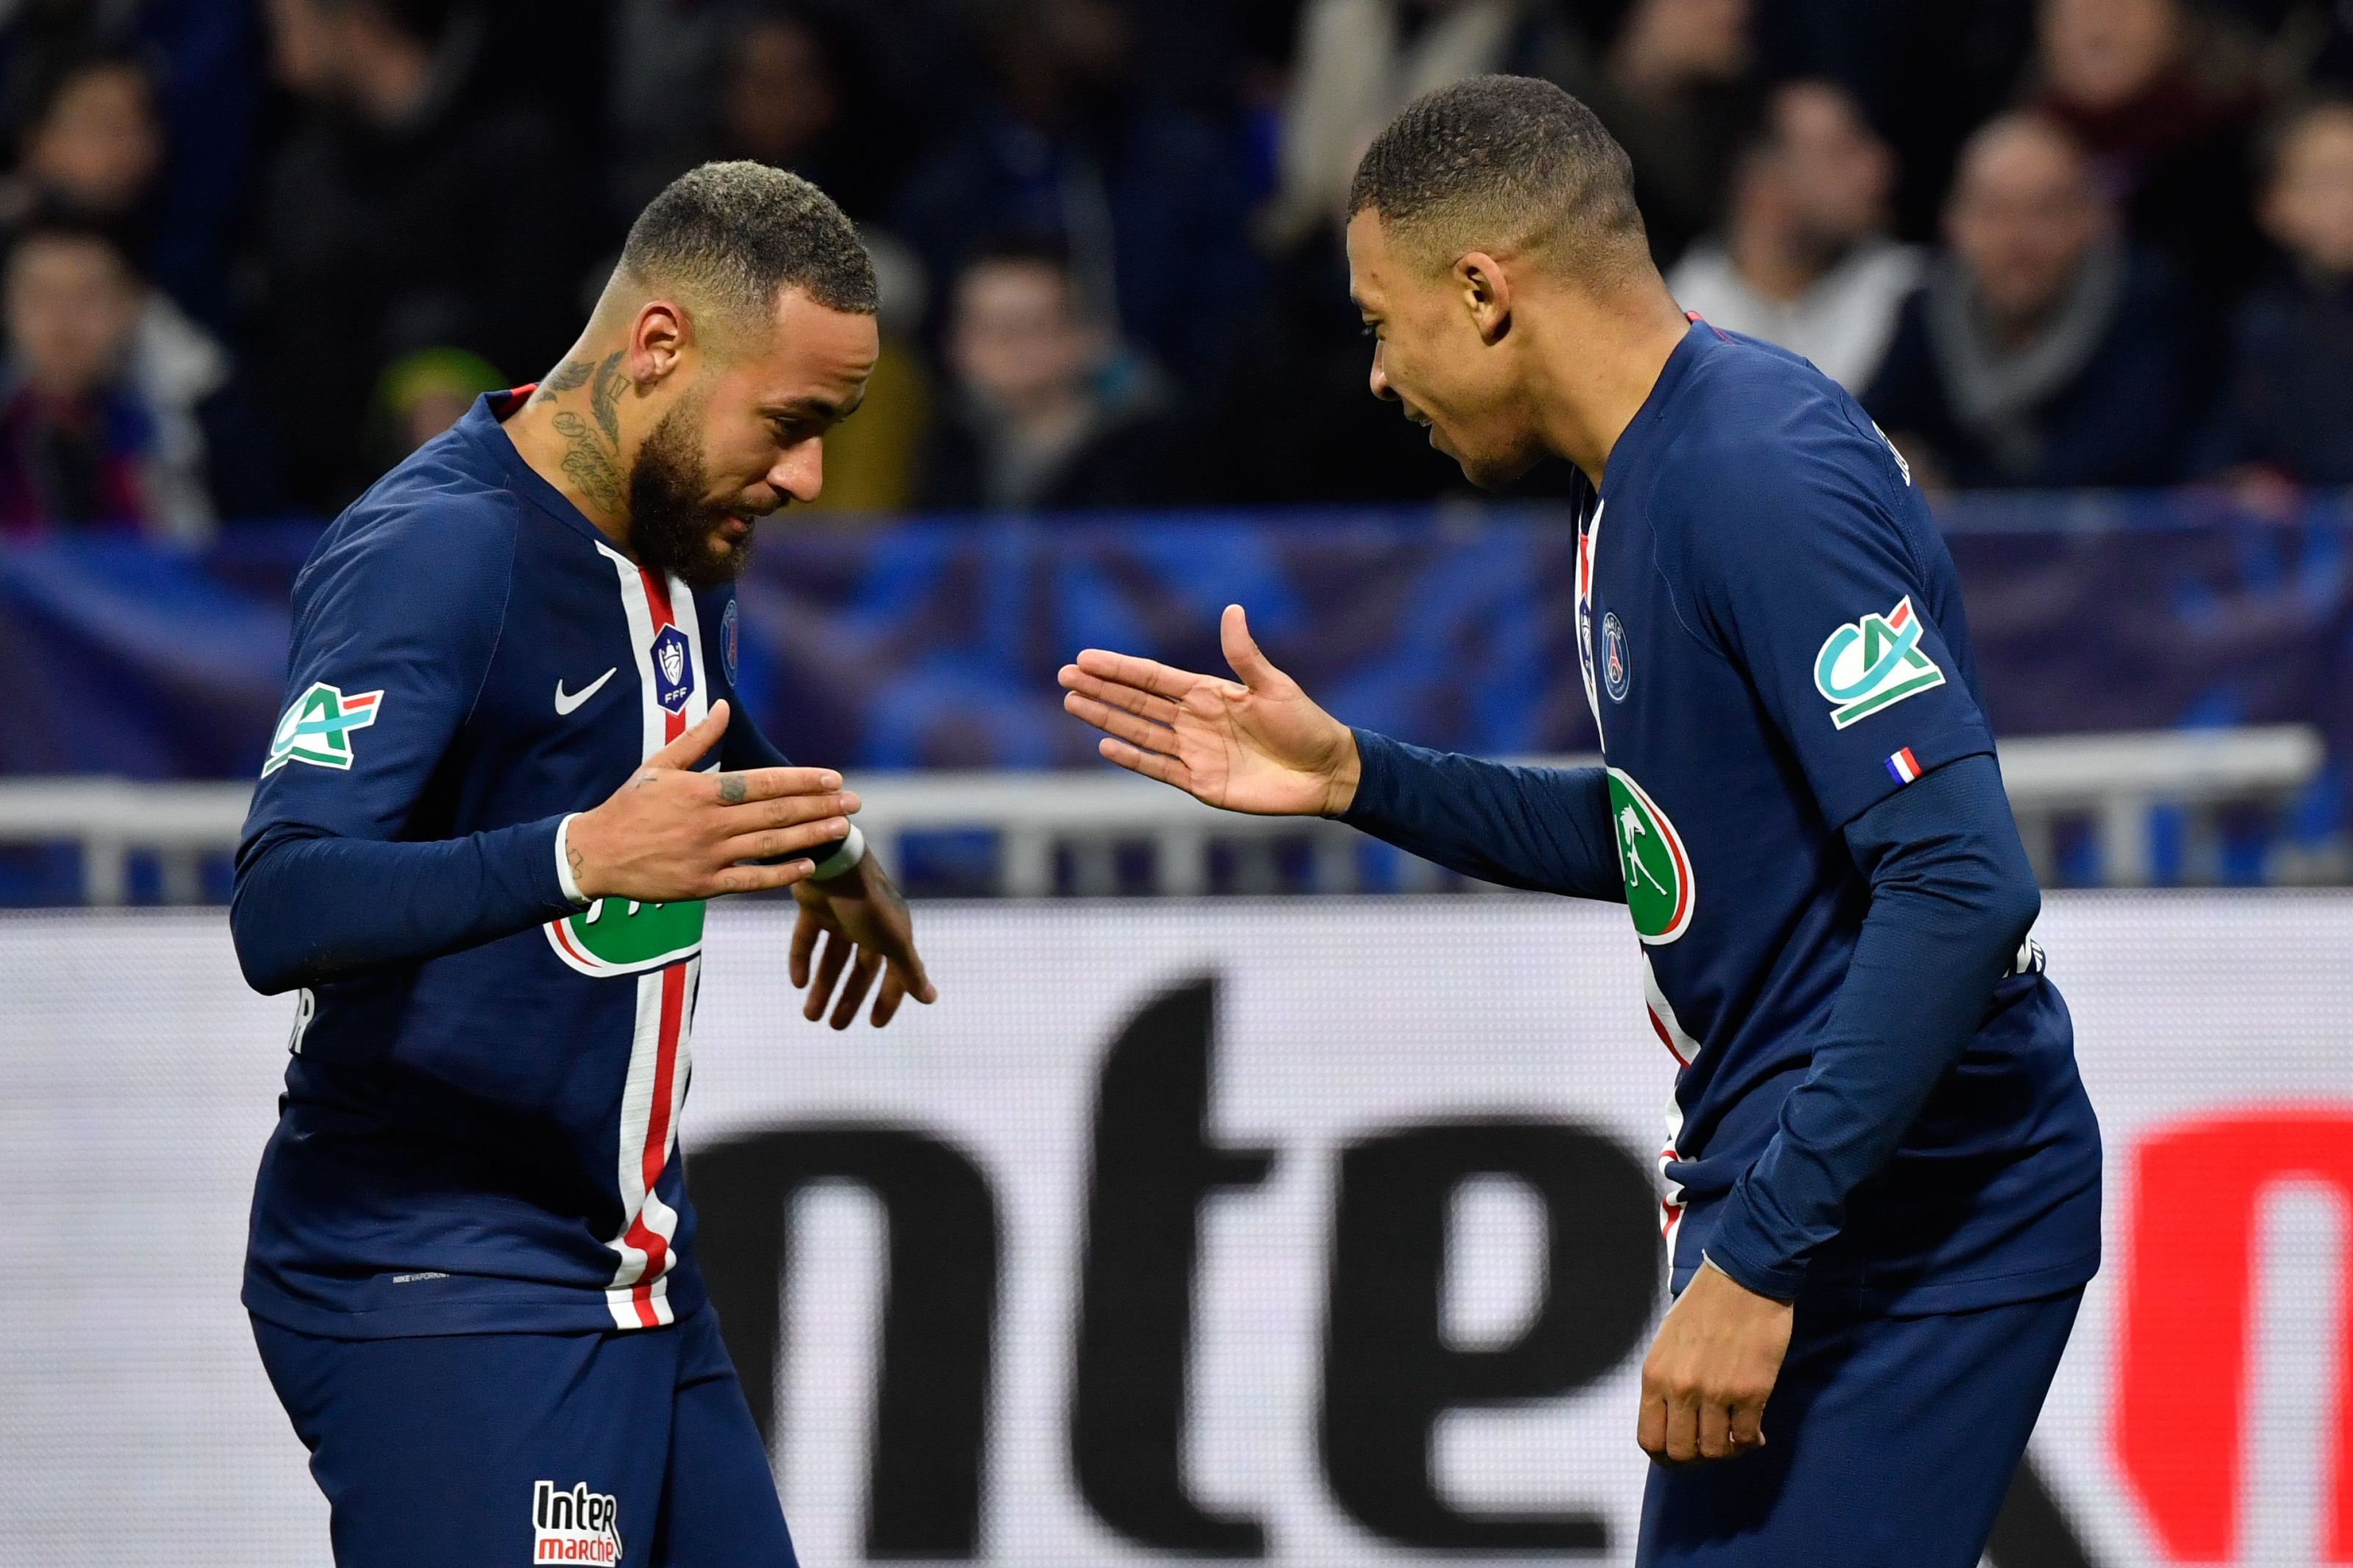 Paris Saint-Germain plot sweet revenge to upset Barcelona's season